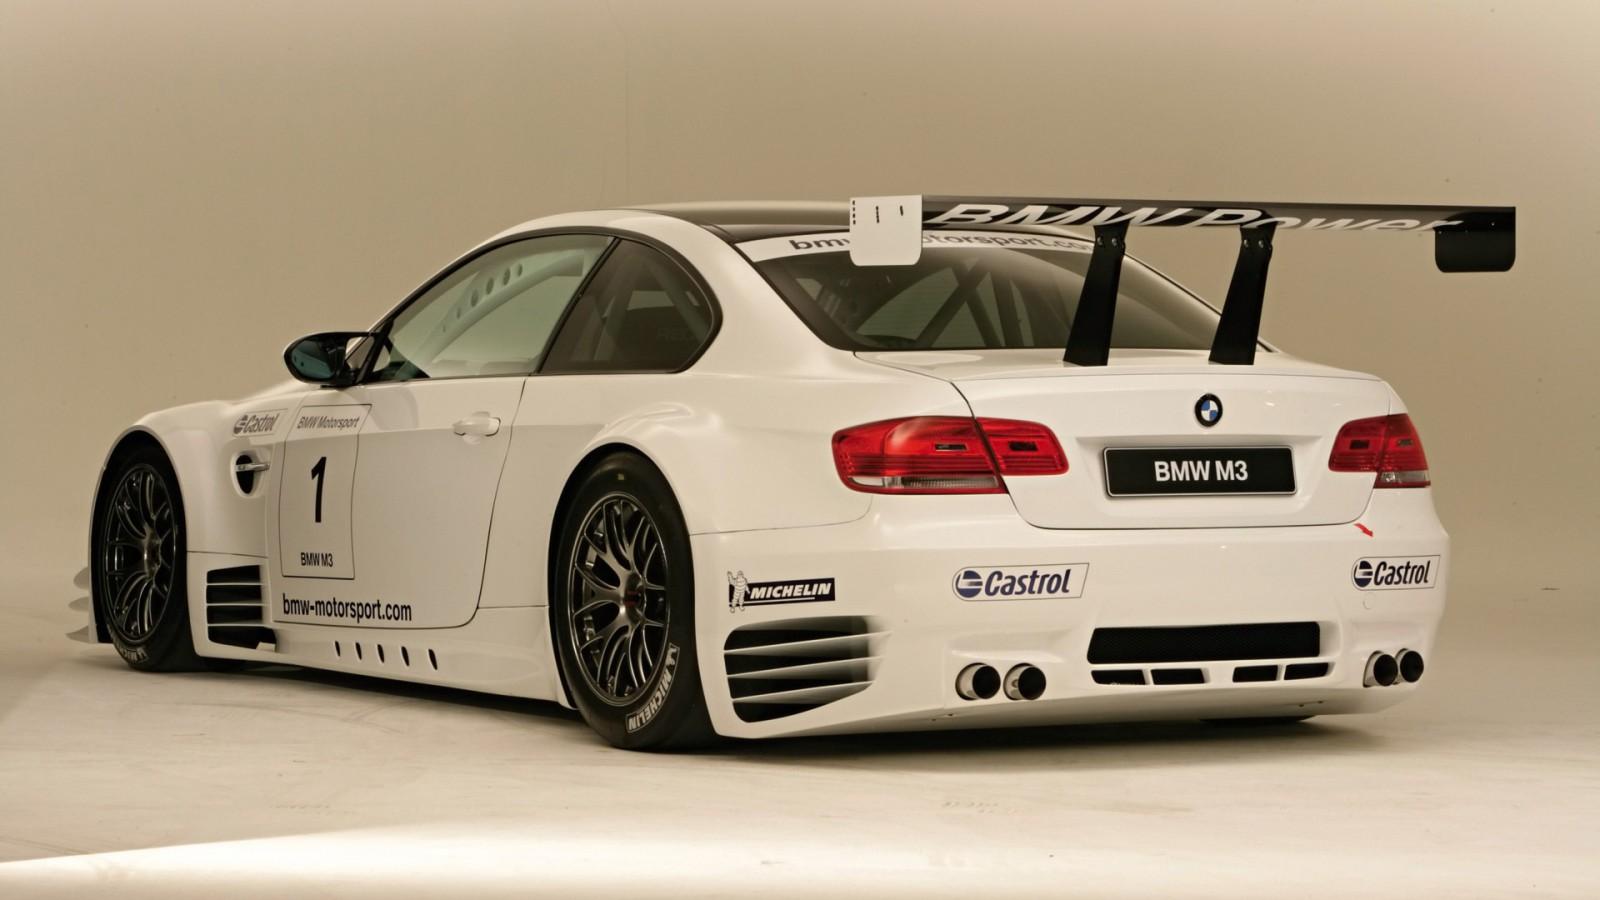 BMW-M3-race-car